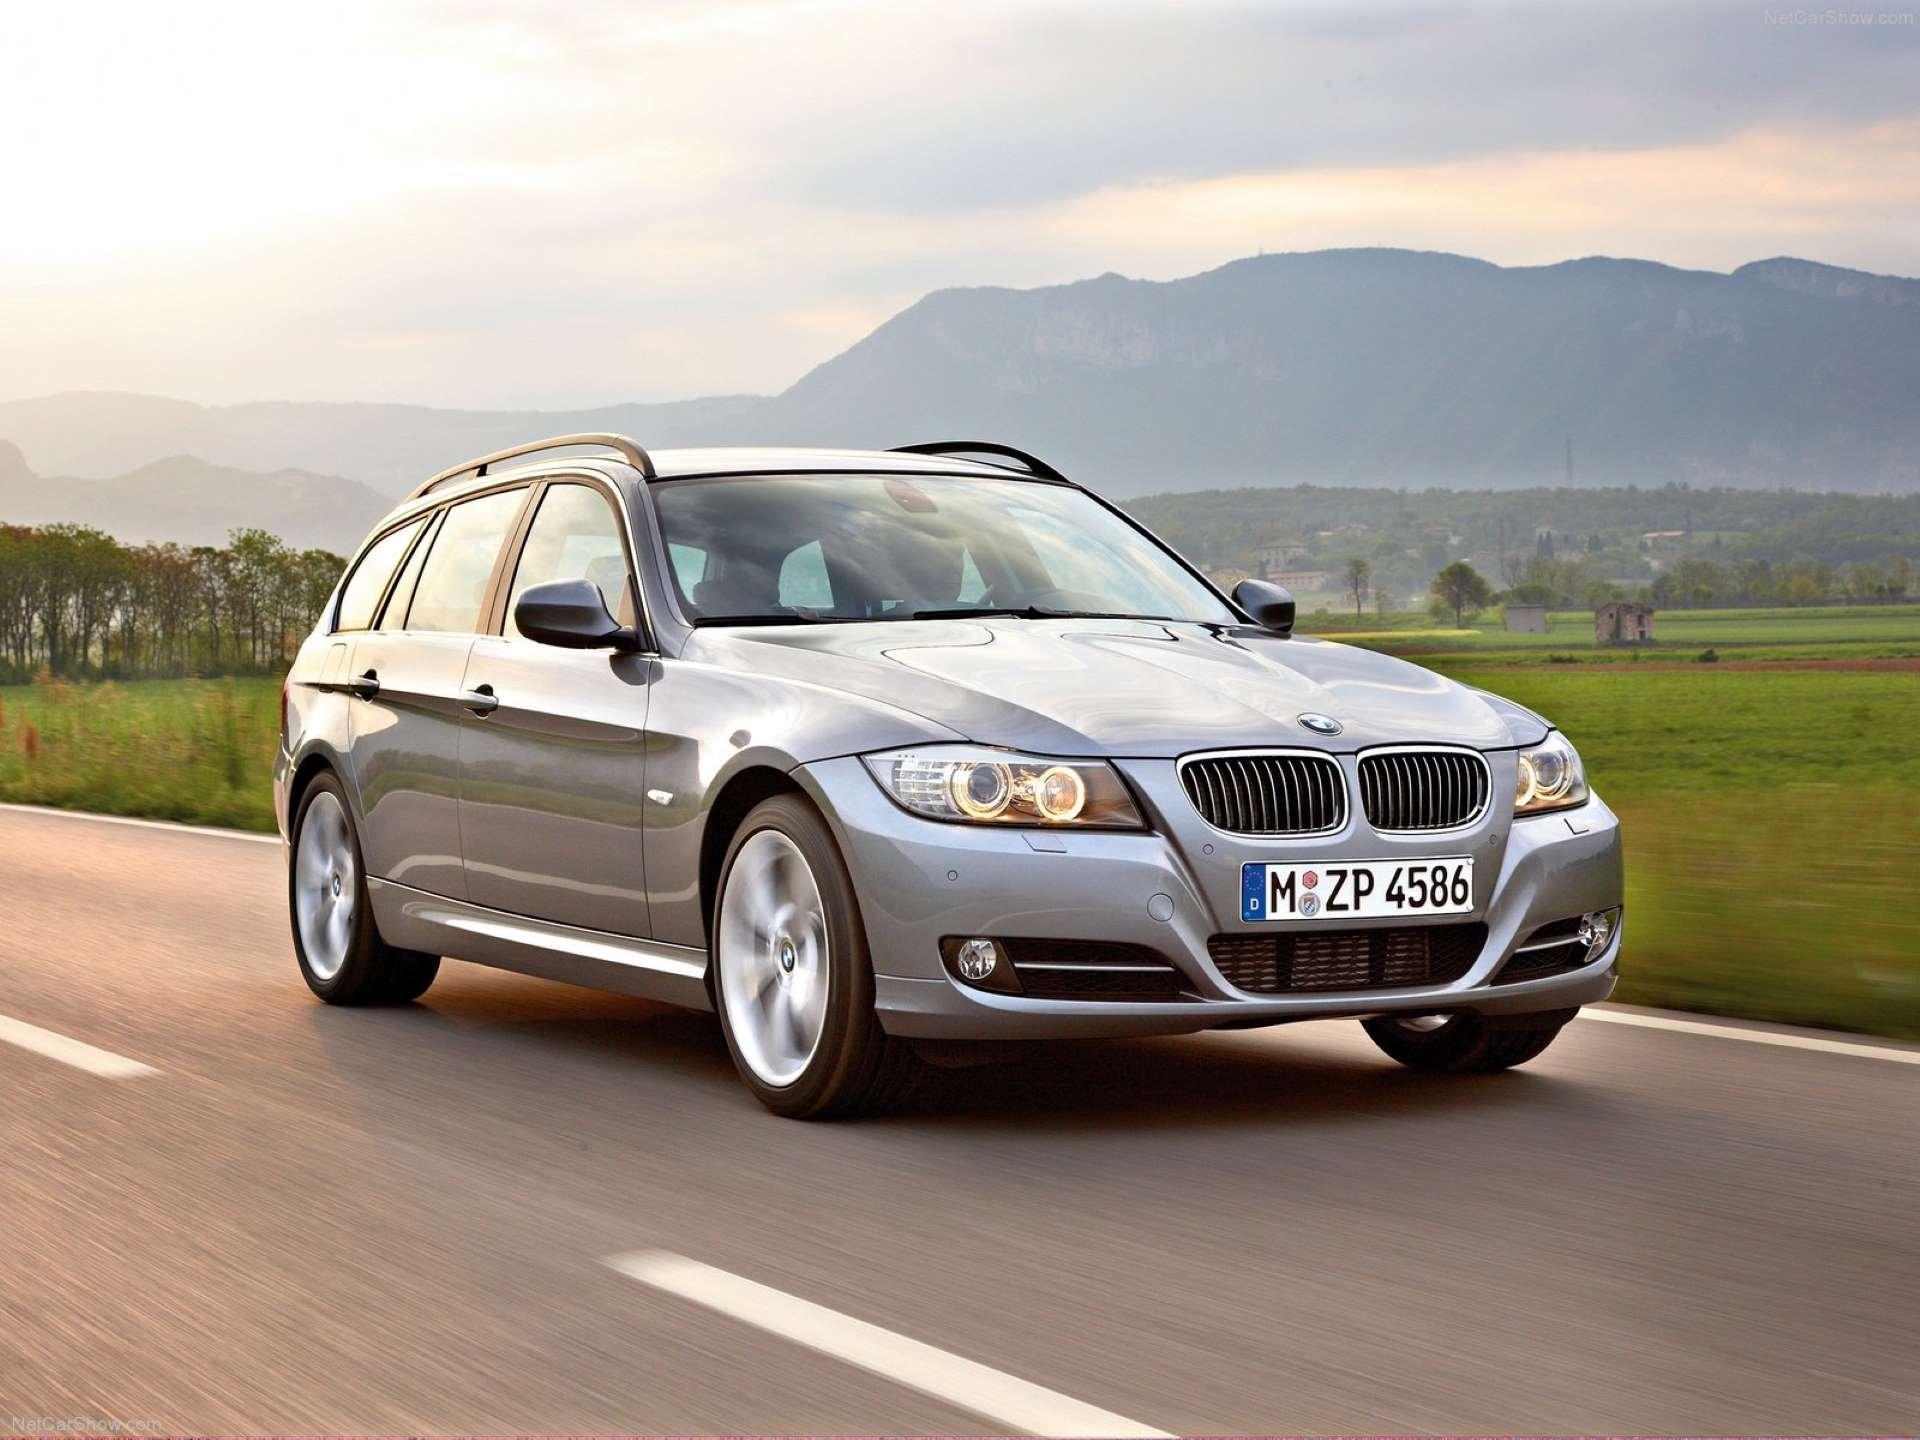 Best RWD Cars under 25K BMW E91 front three-quarter